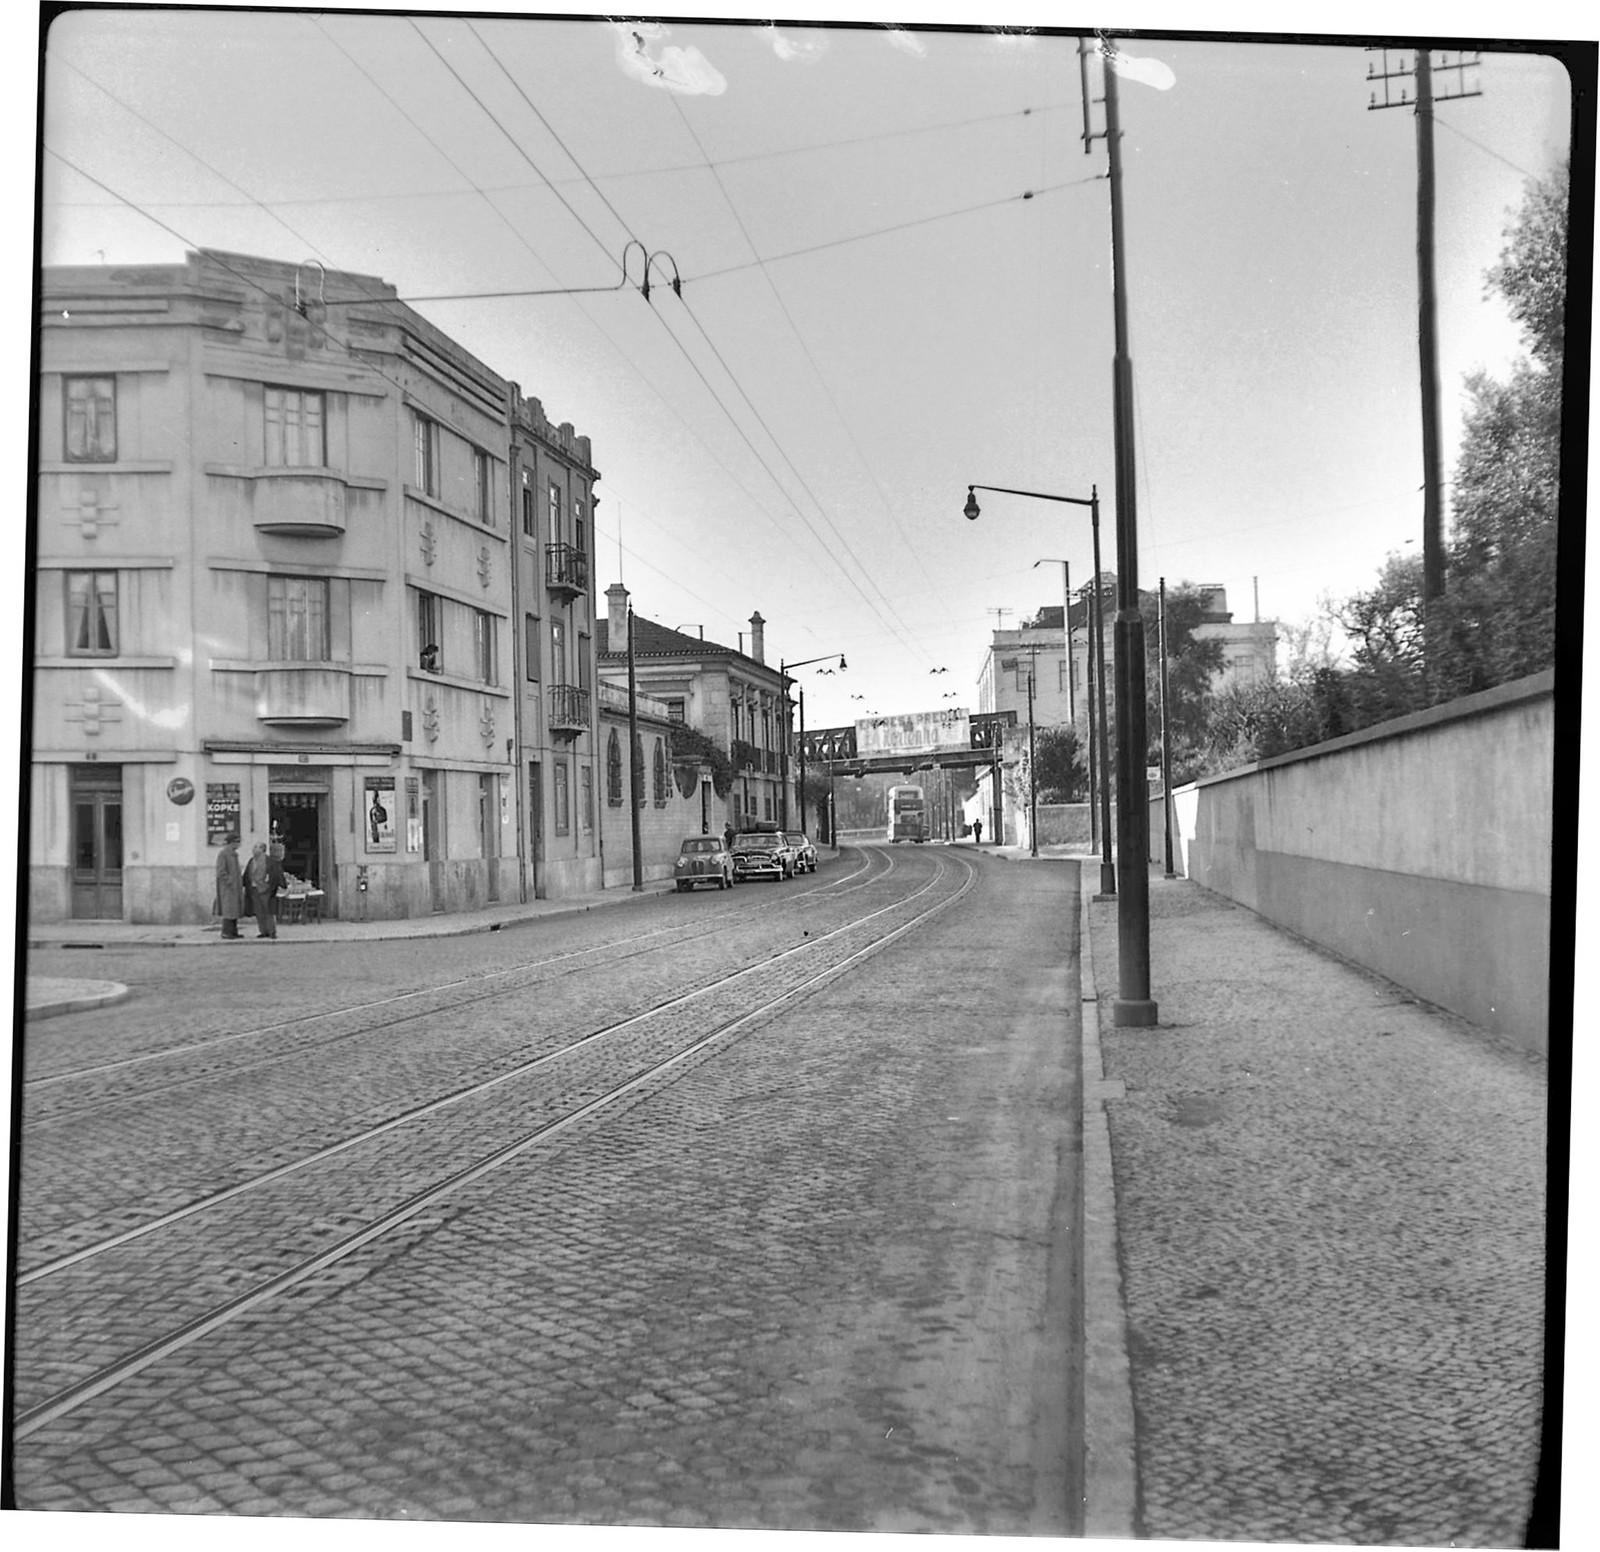 Estrada de Benfica entre a Palhavã e Sete Rios (A. I. Bastos, 1961)